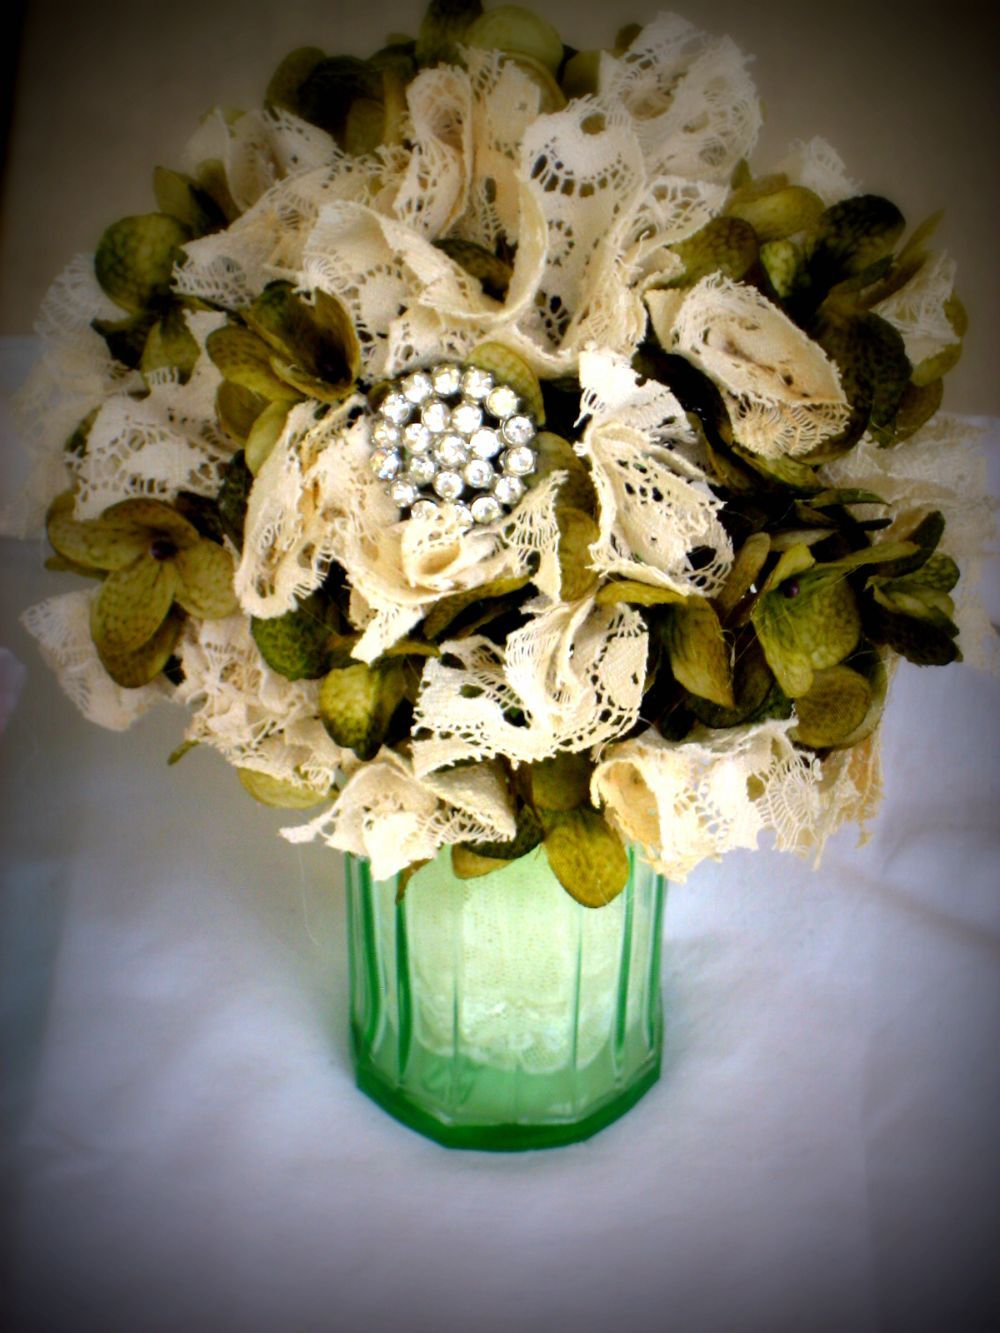 Flowers & Decor, Decor, Small, Design whimsy